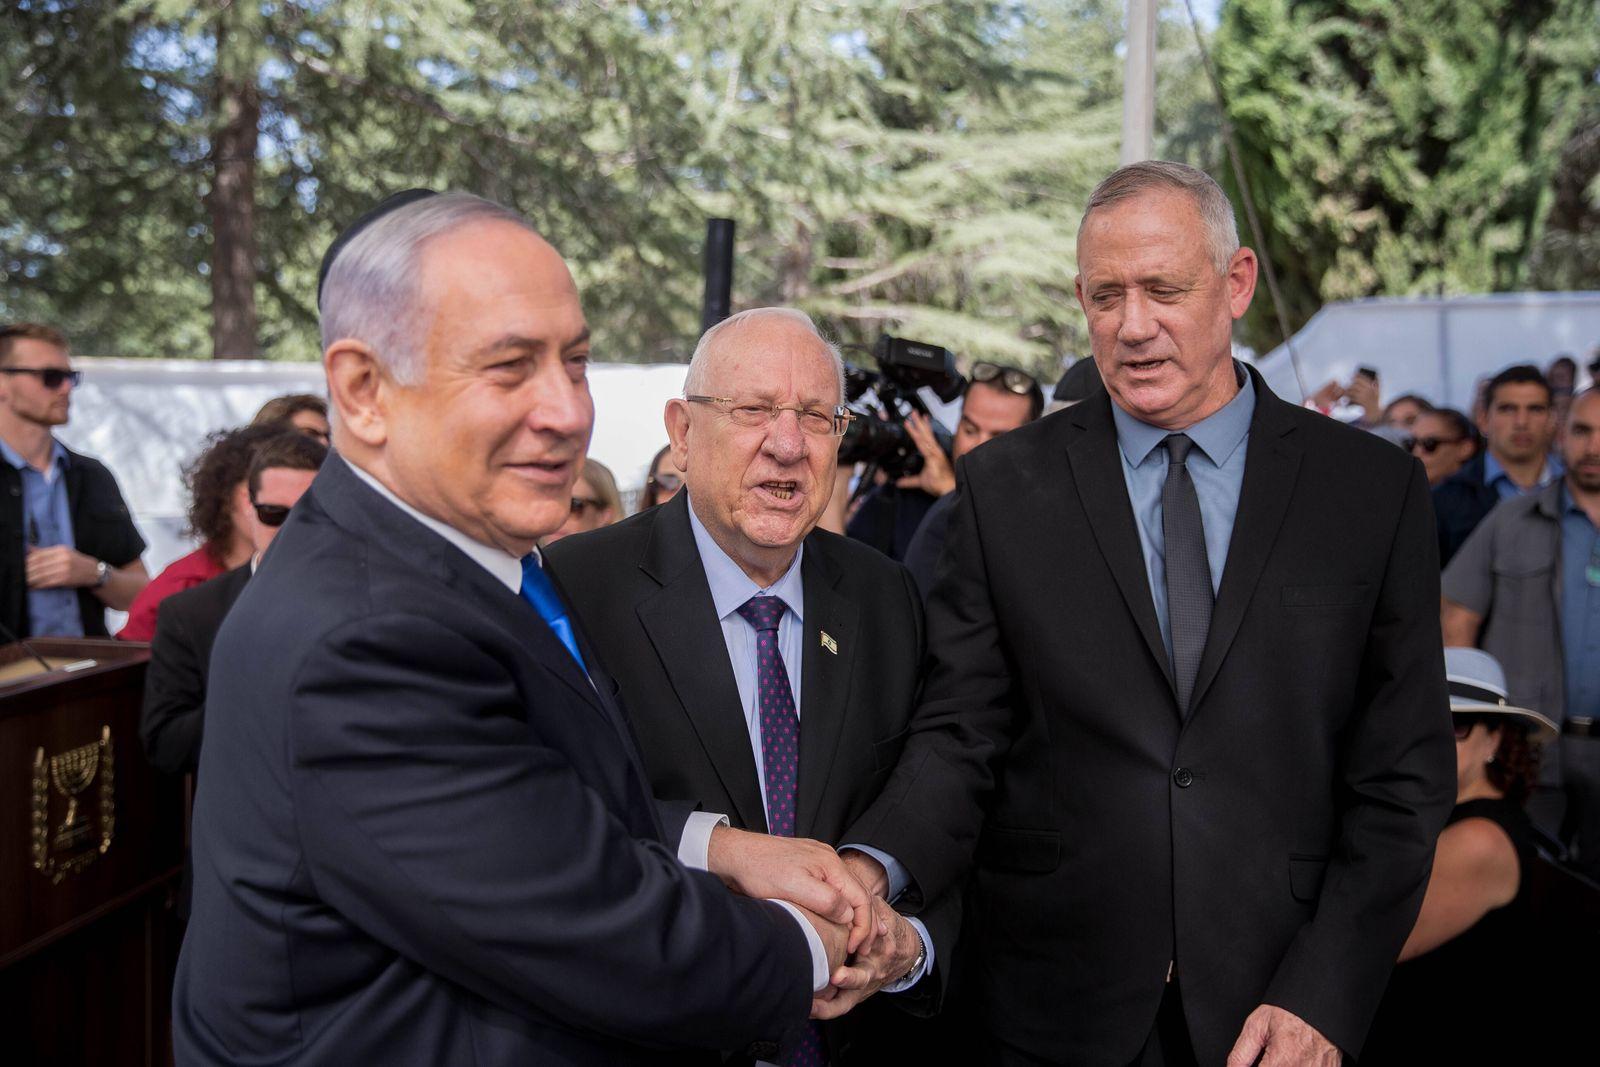 (190919) -- JERUSALEM, Sept. 19, 2019 (Xinhua) -- Israeli Prime Minister Benjamin Netanyahu (L), Israeli President Reuv